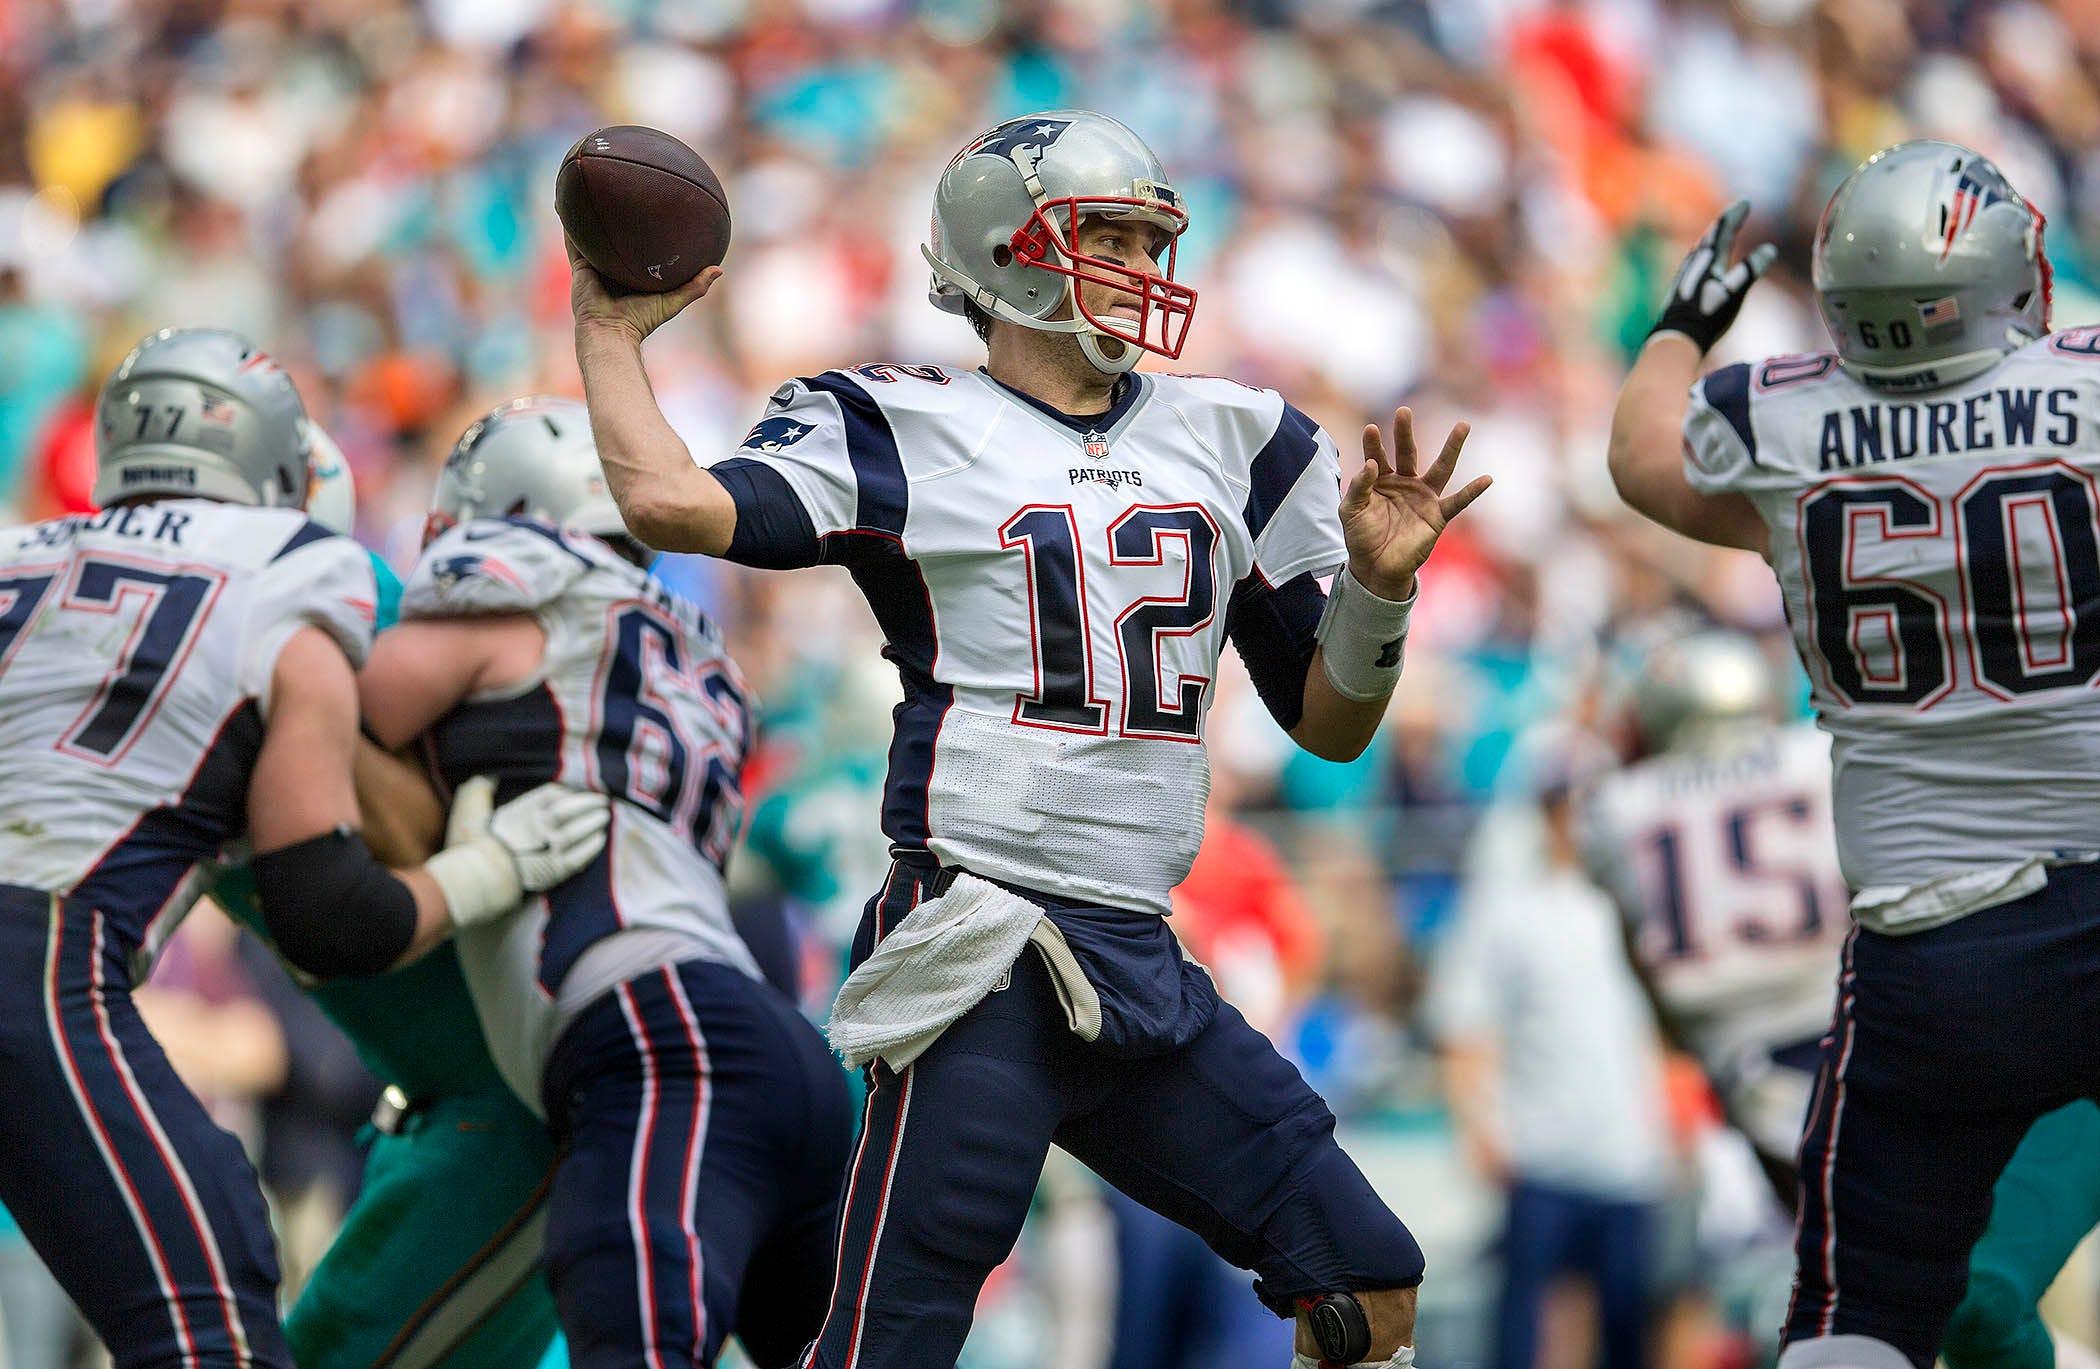 Ranking the Best Quarterbacks in New England Patriots History